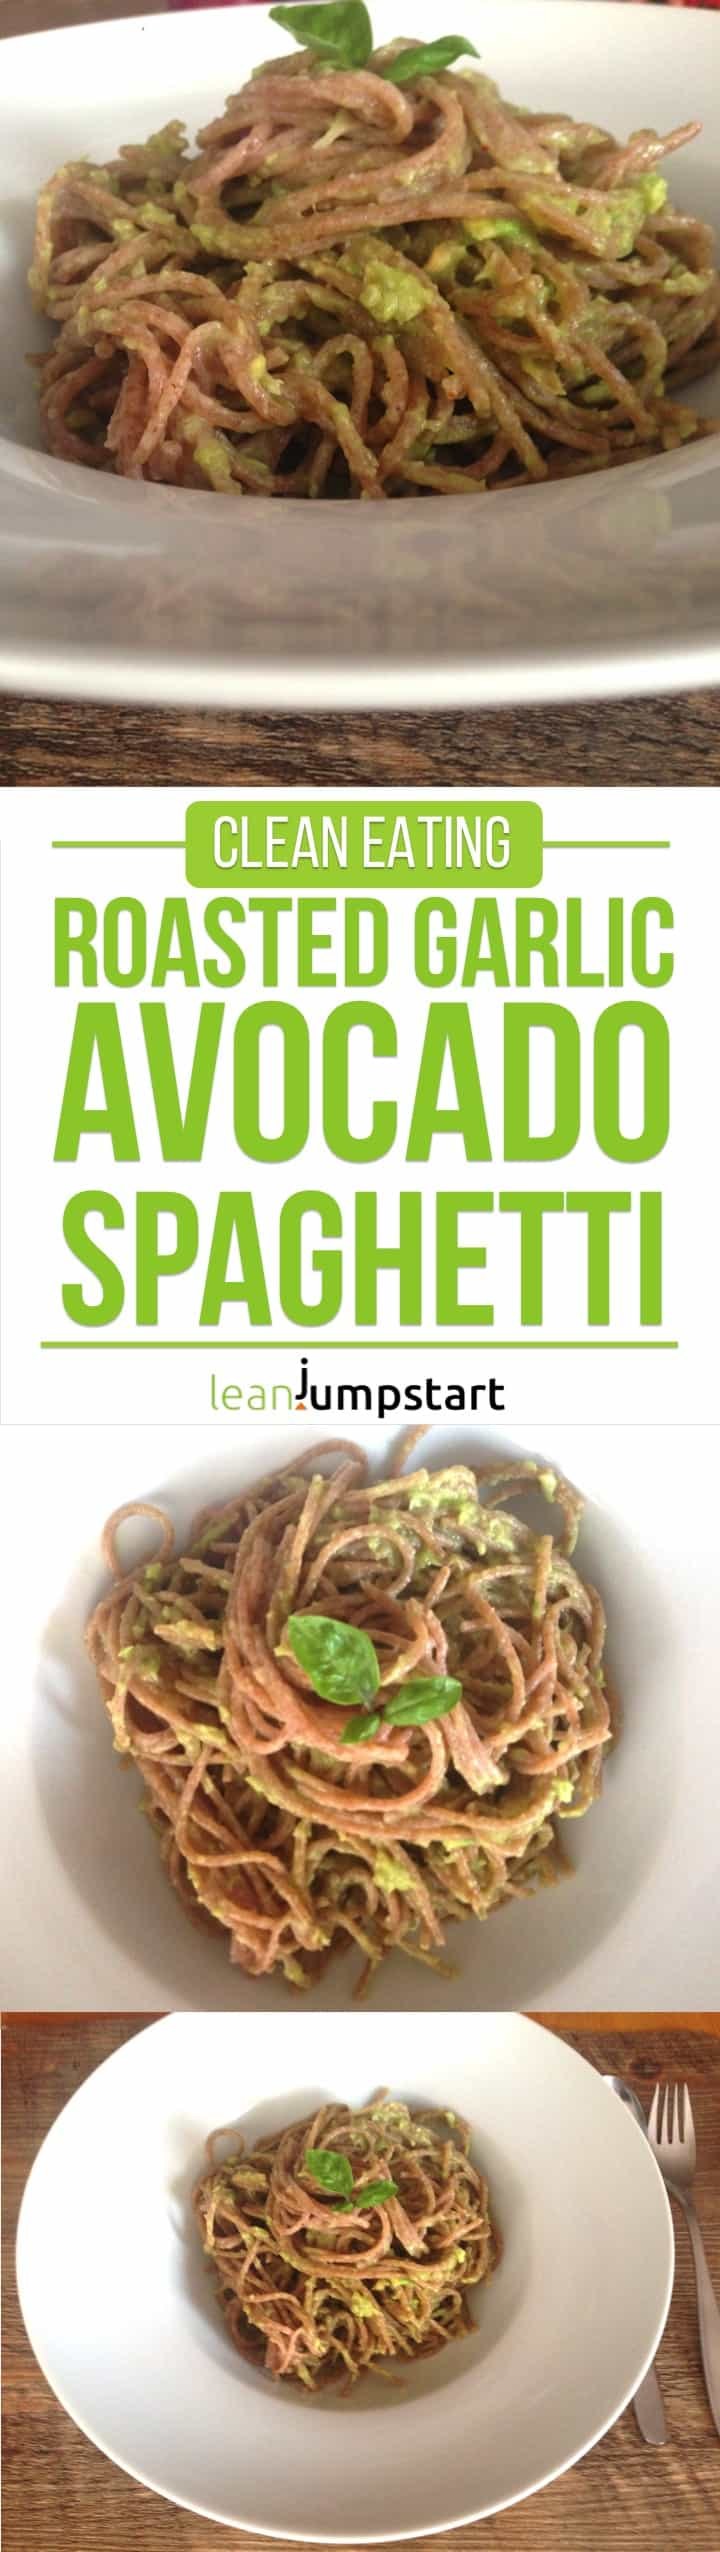 roasted garlic avocado spaghetti: a fiber rich pasta meal, easy, clean and delicious